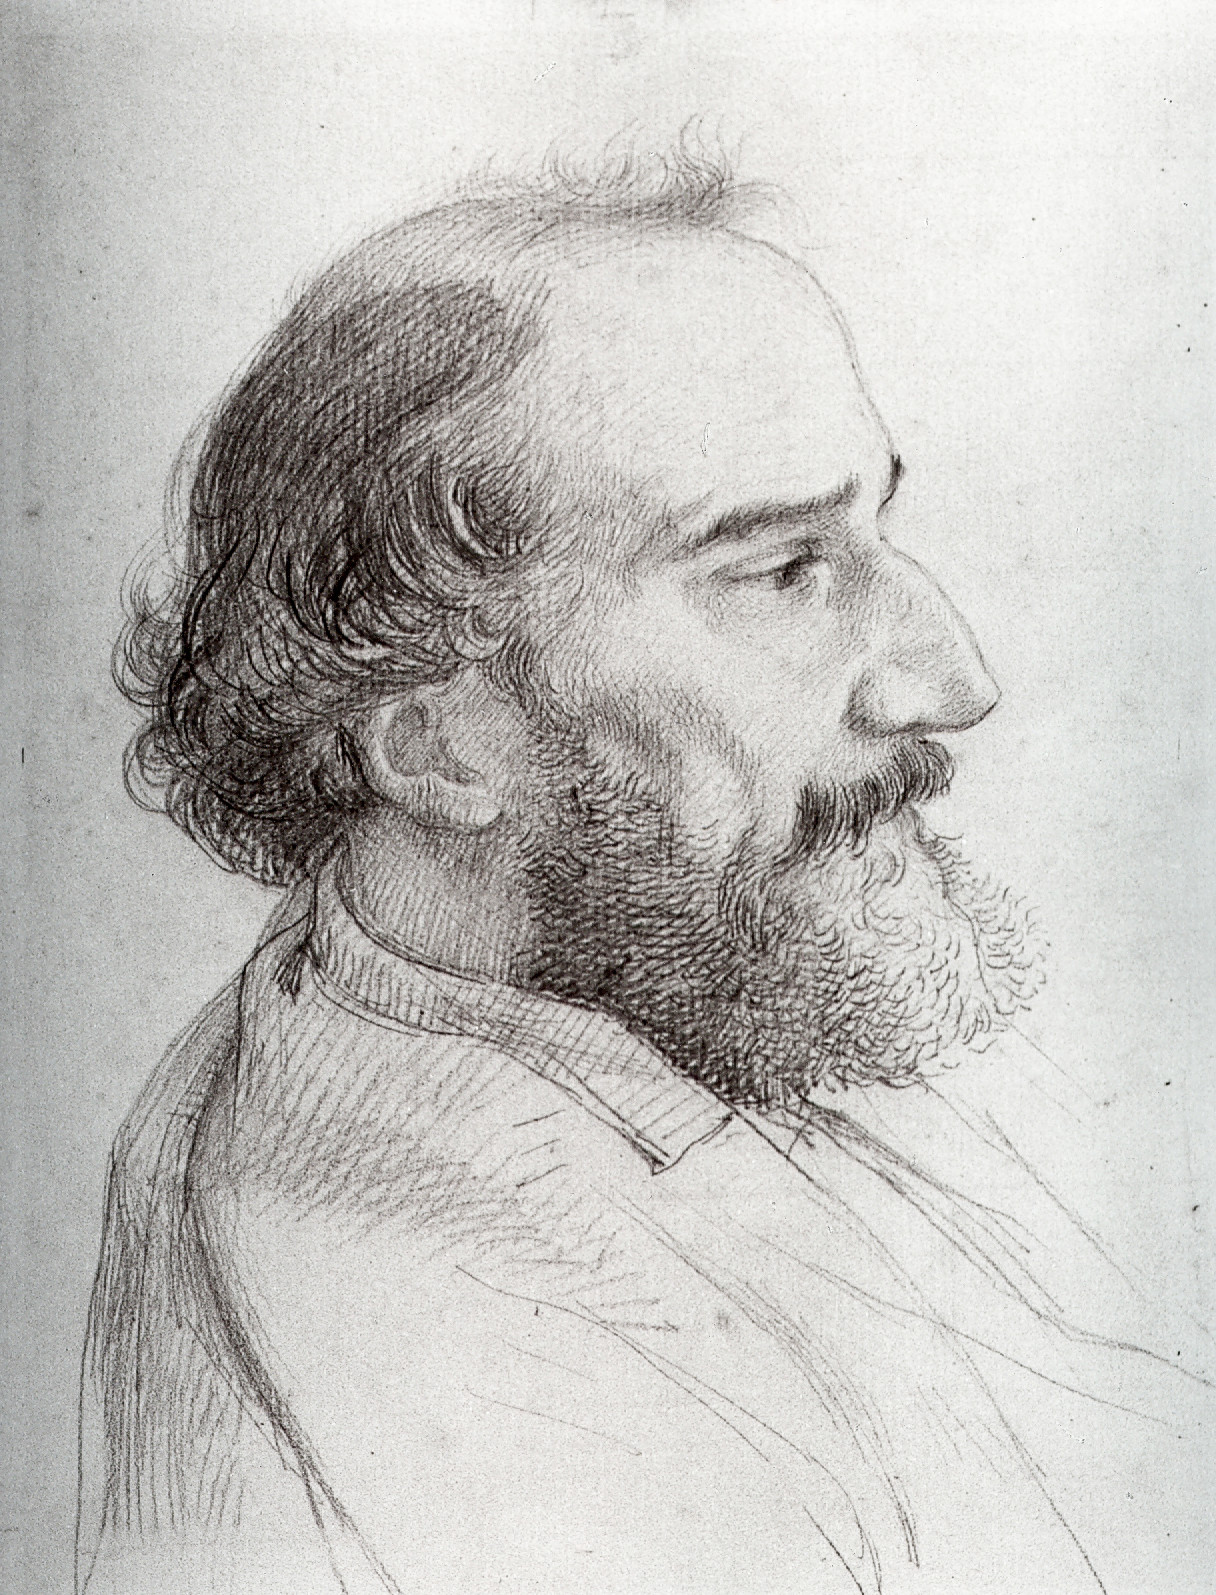 Howard, Ritratto di Nino Costa.jpg